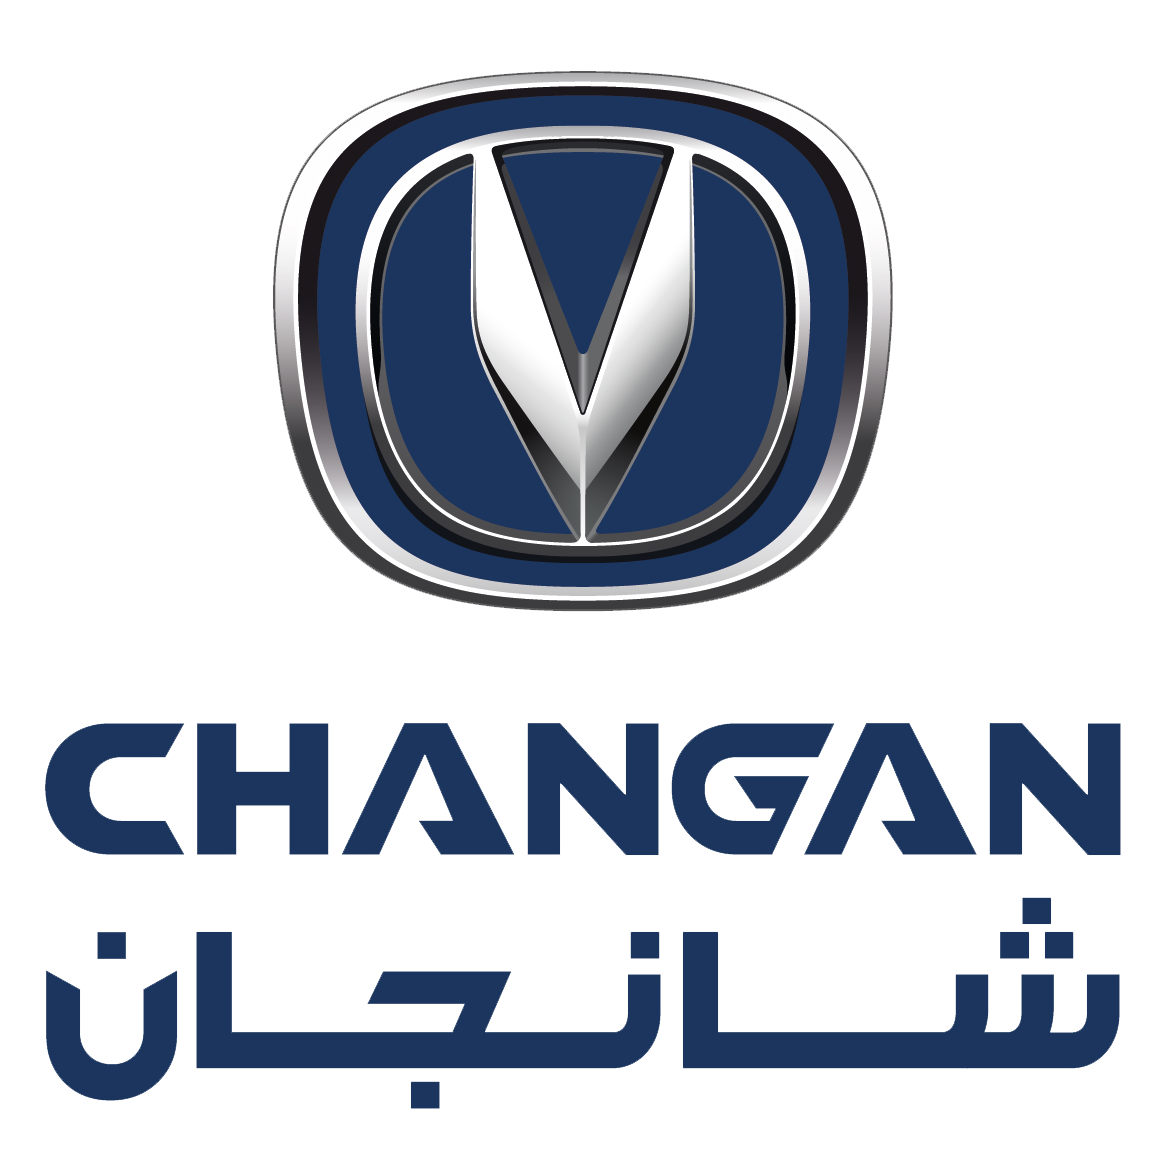 Changan logo clipart png stock Home | Changan | CHINESE AUTOMOBILES | Buick logo, Buick, Logos png stock